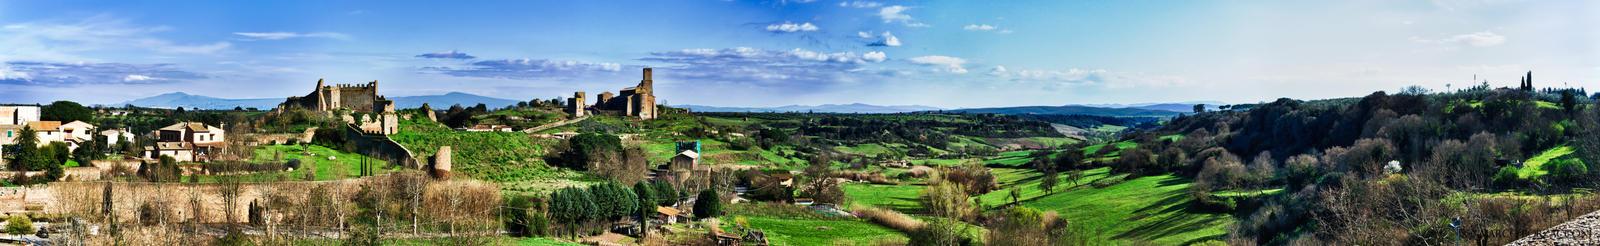 Panorama of Tuscania, full by Tiris76